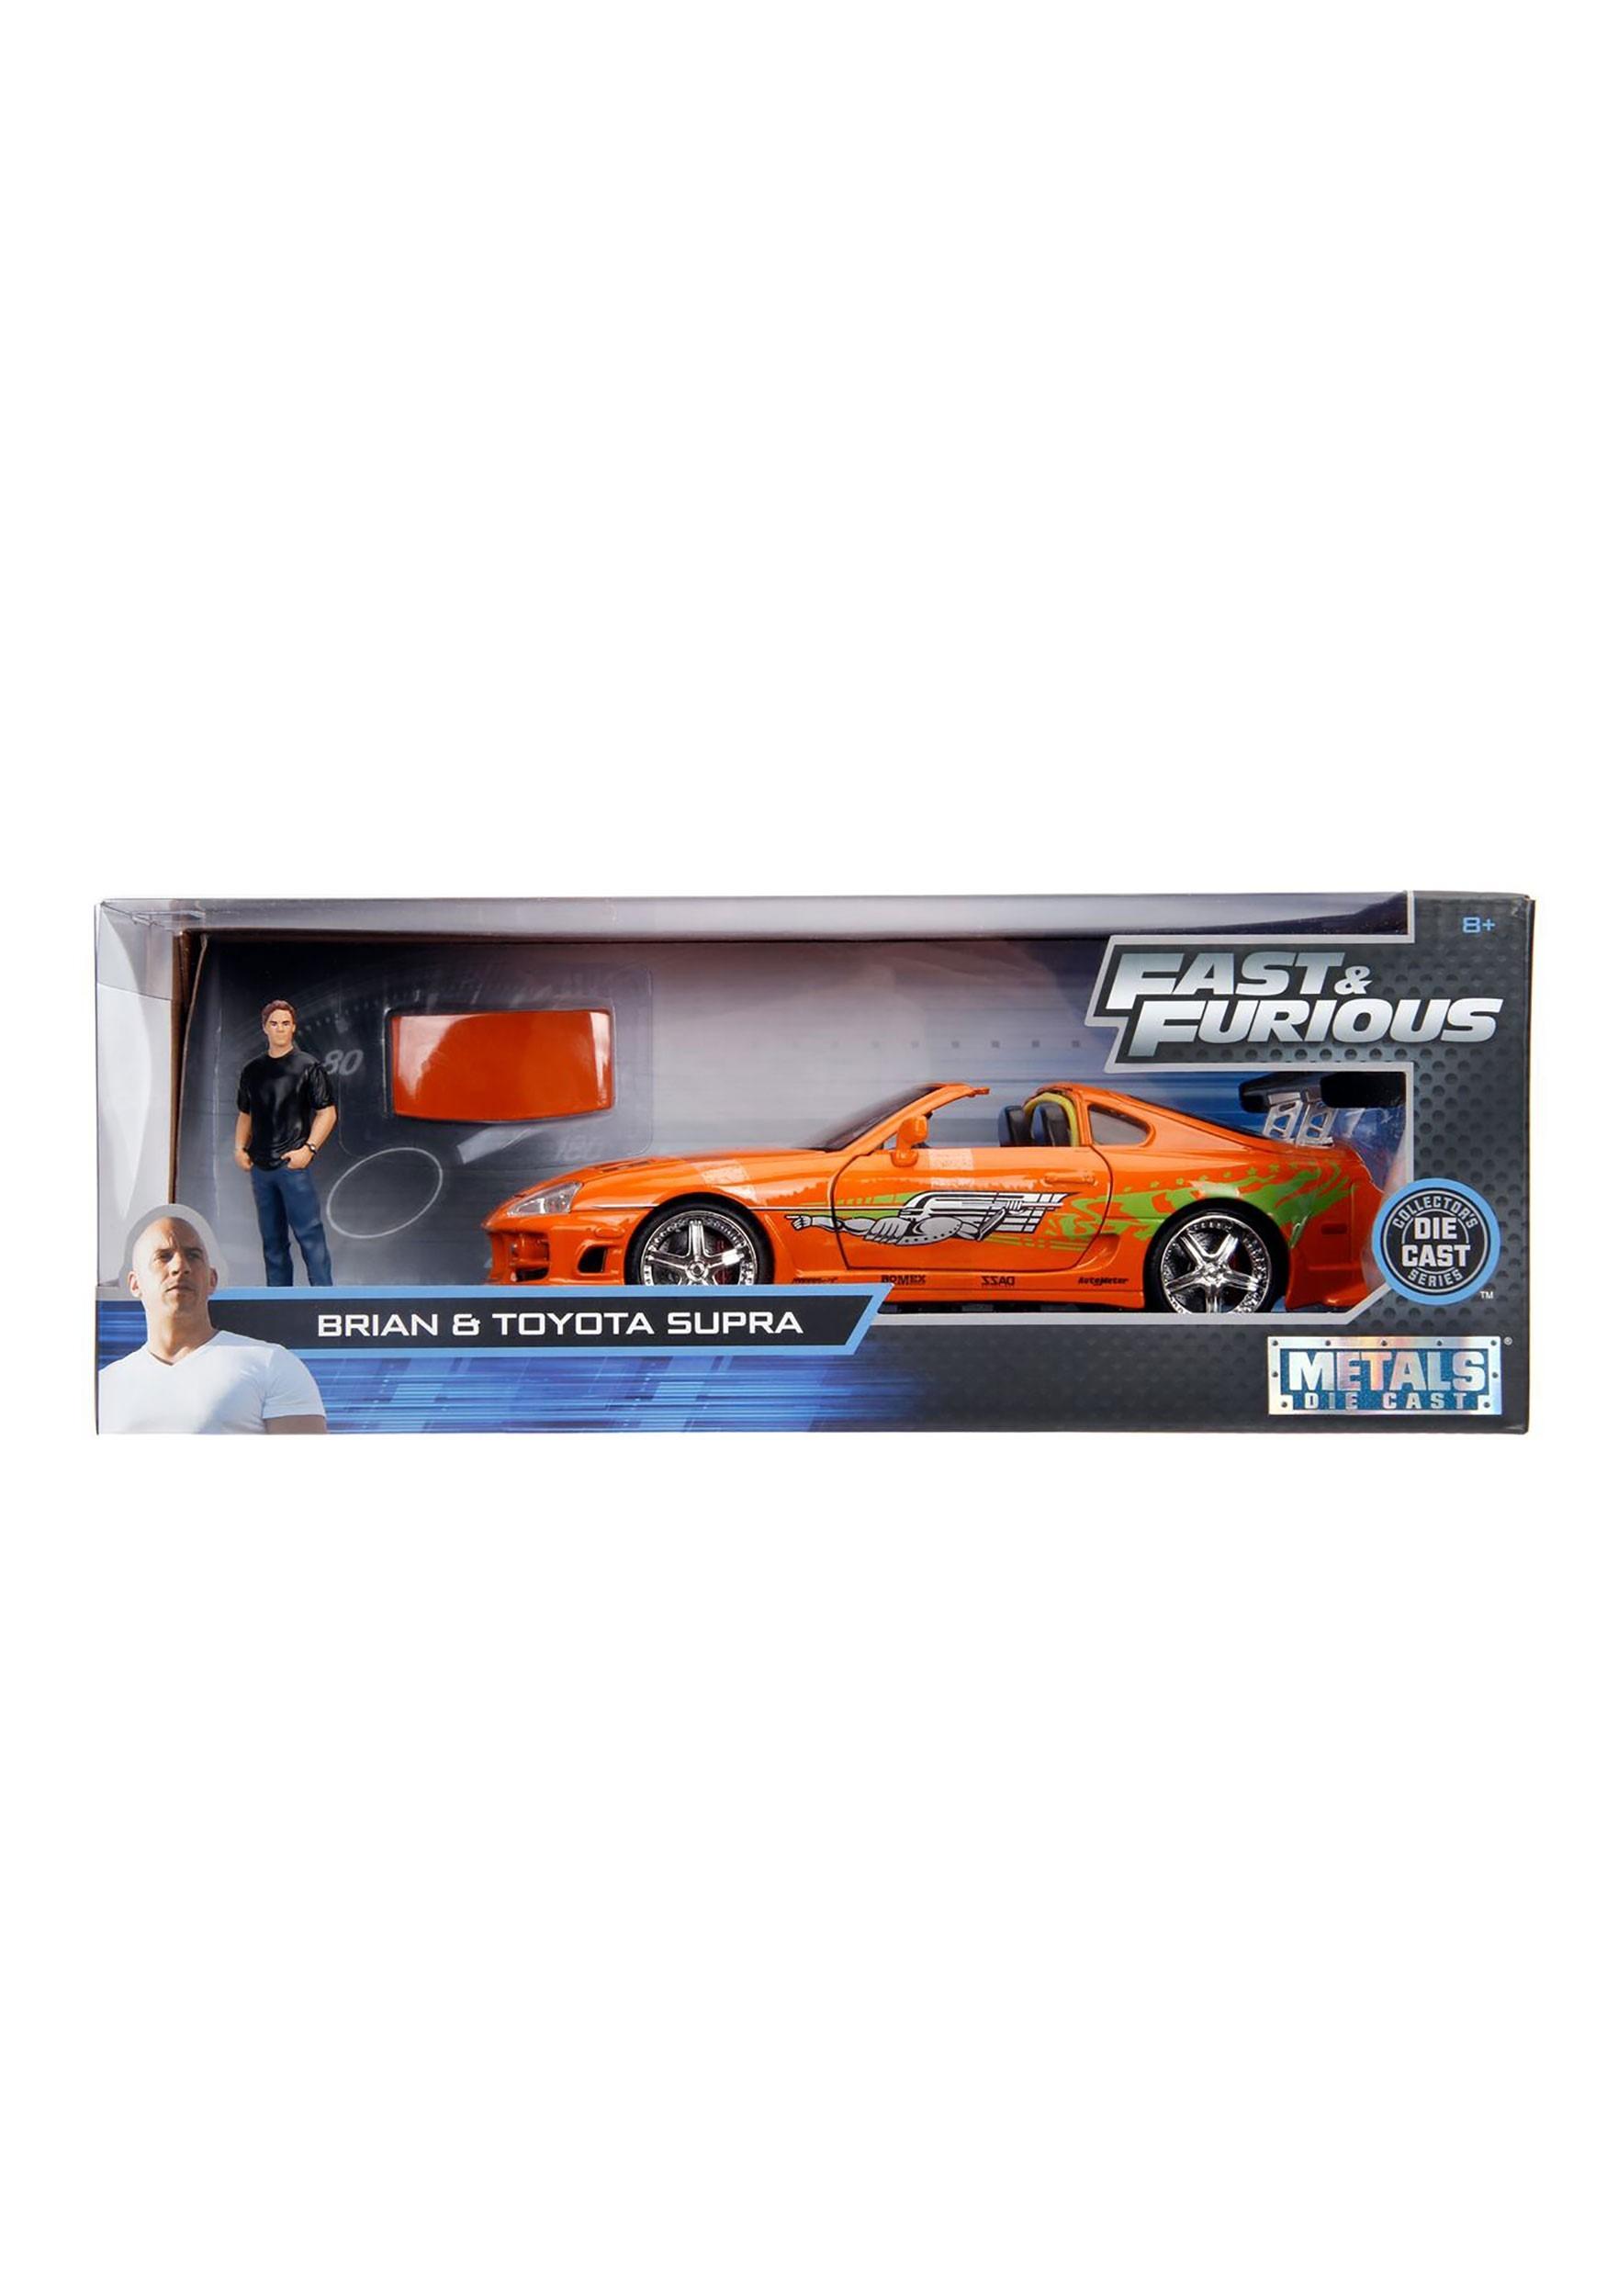 1:24 Scale Vehicle w/ Figure Toyota Supra w/ Brian